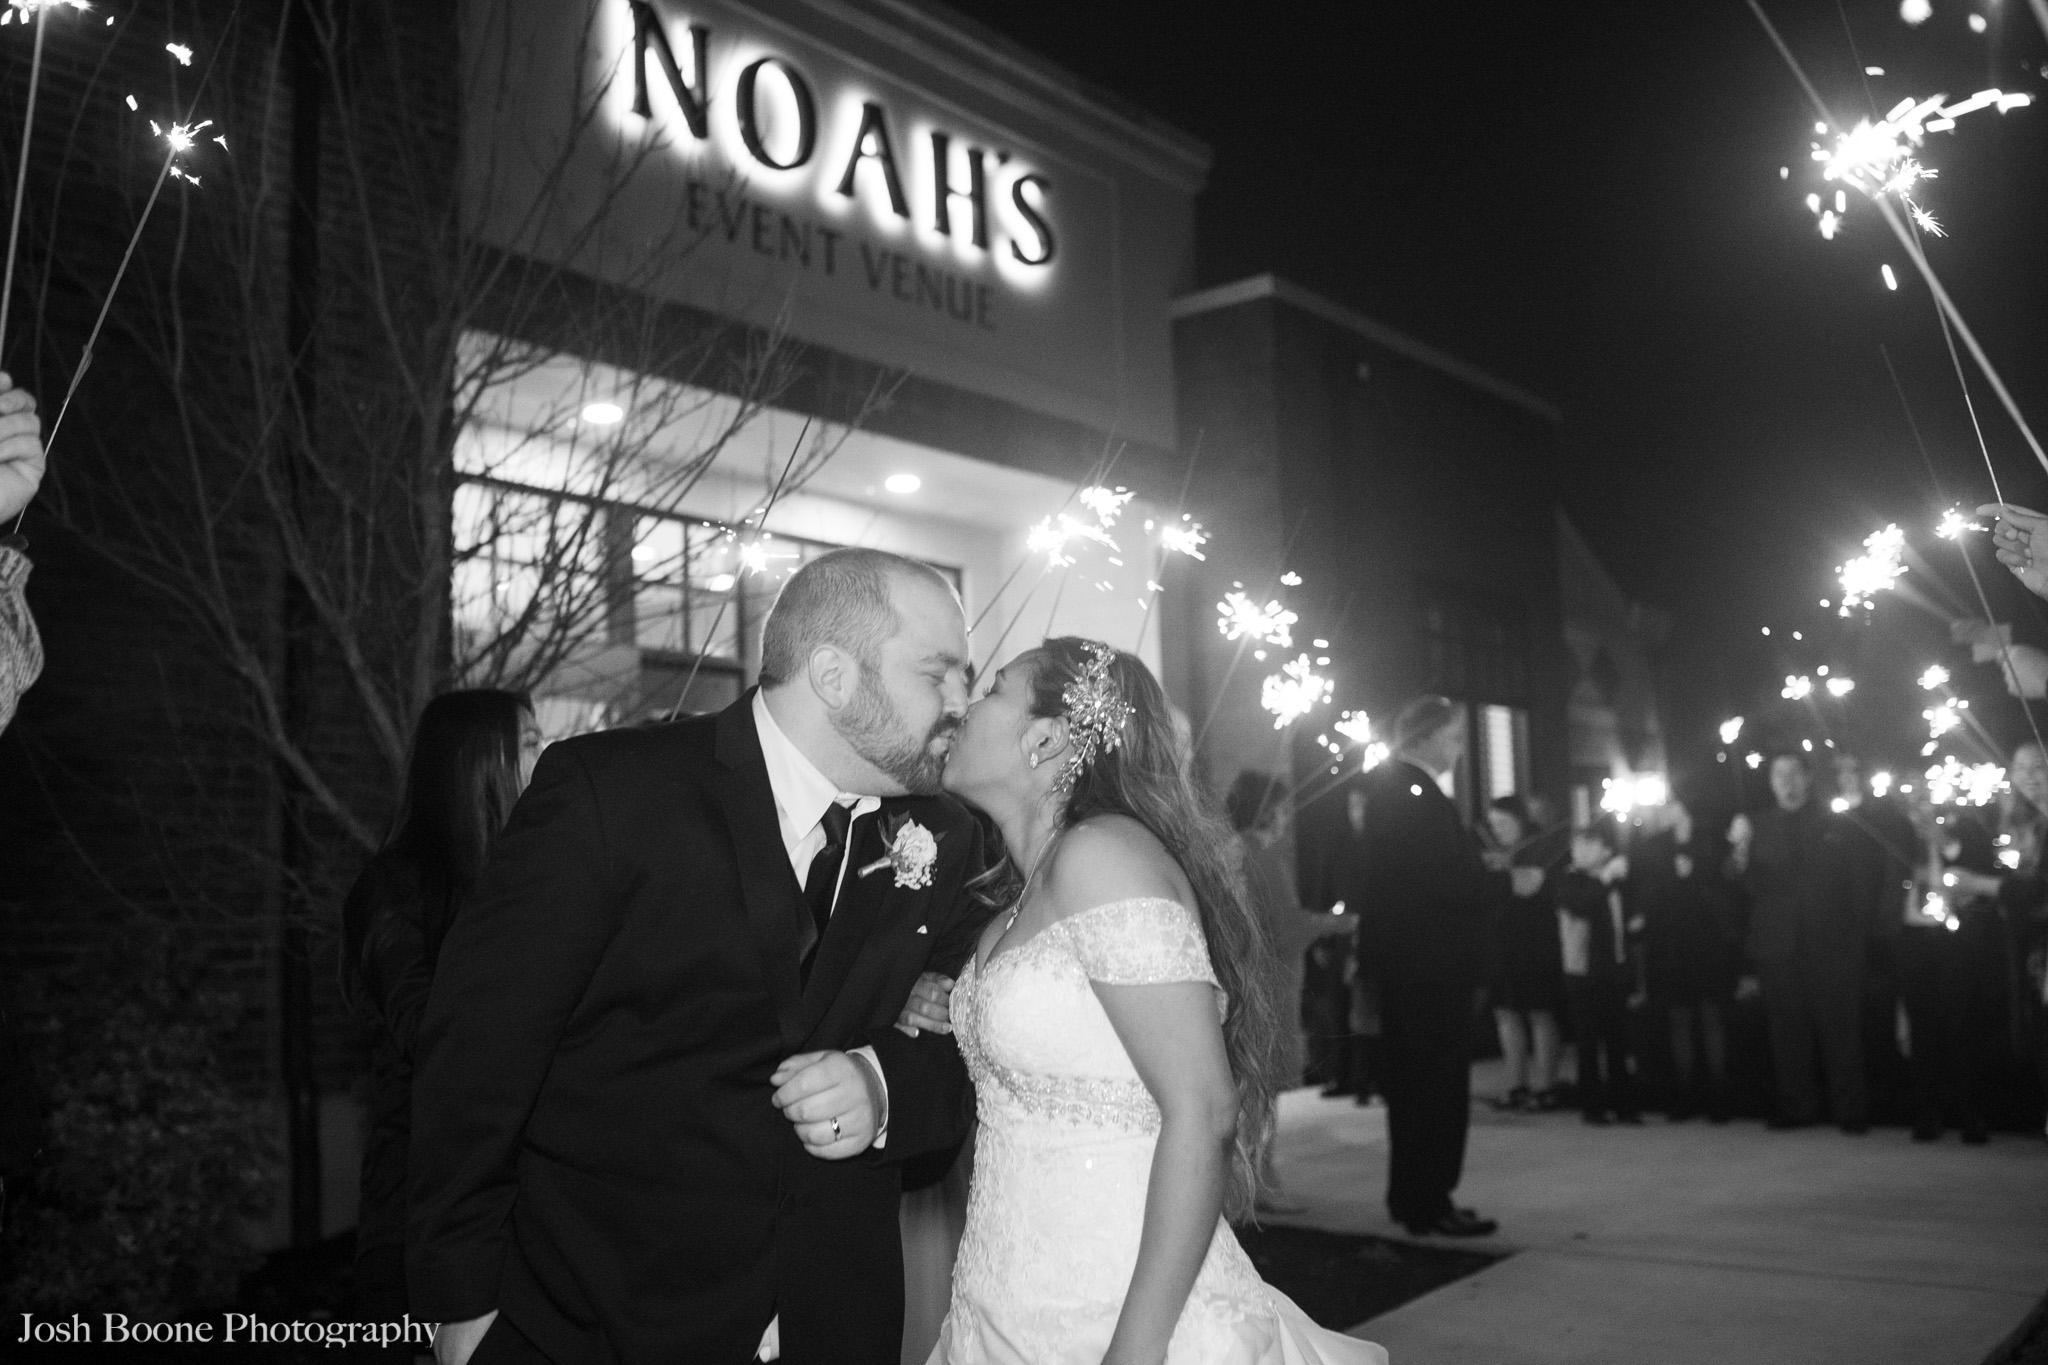 noahs_event_venue_wedding-108.jpg